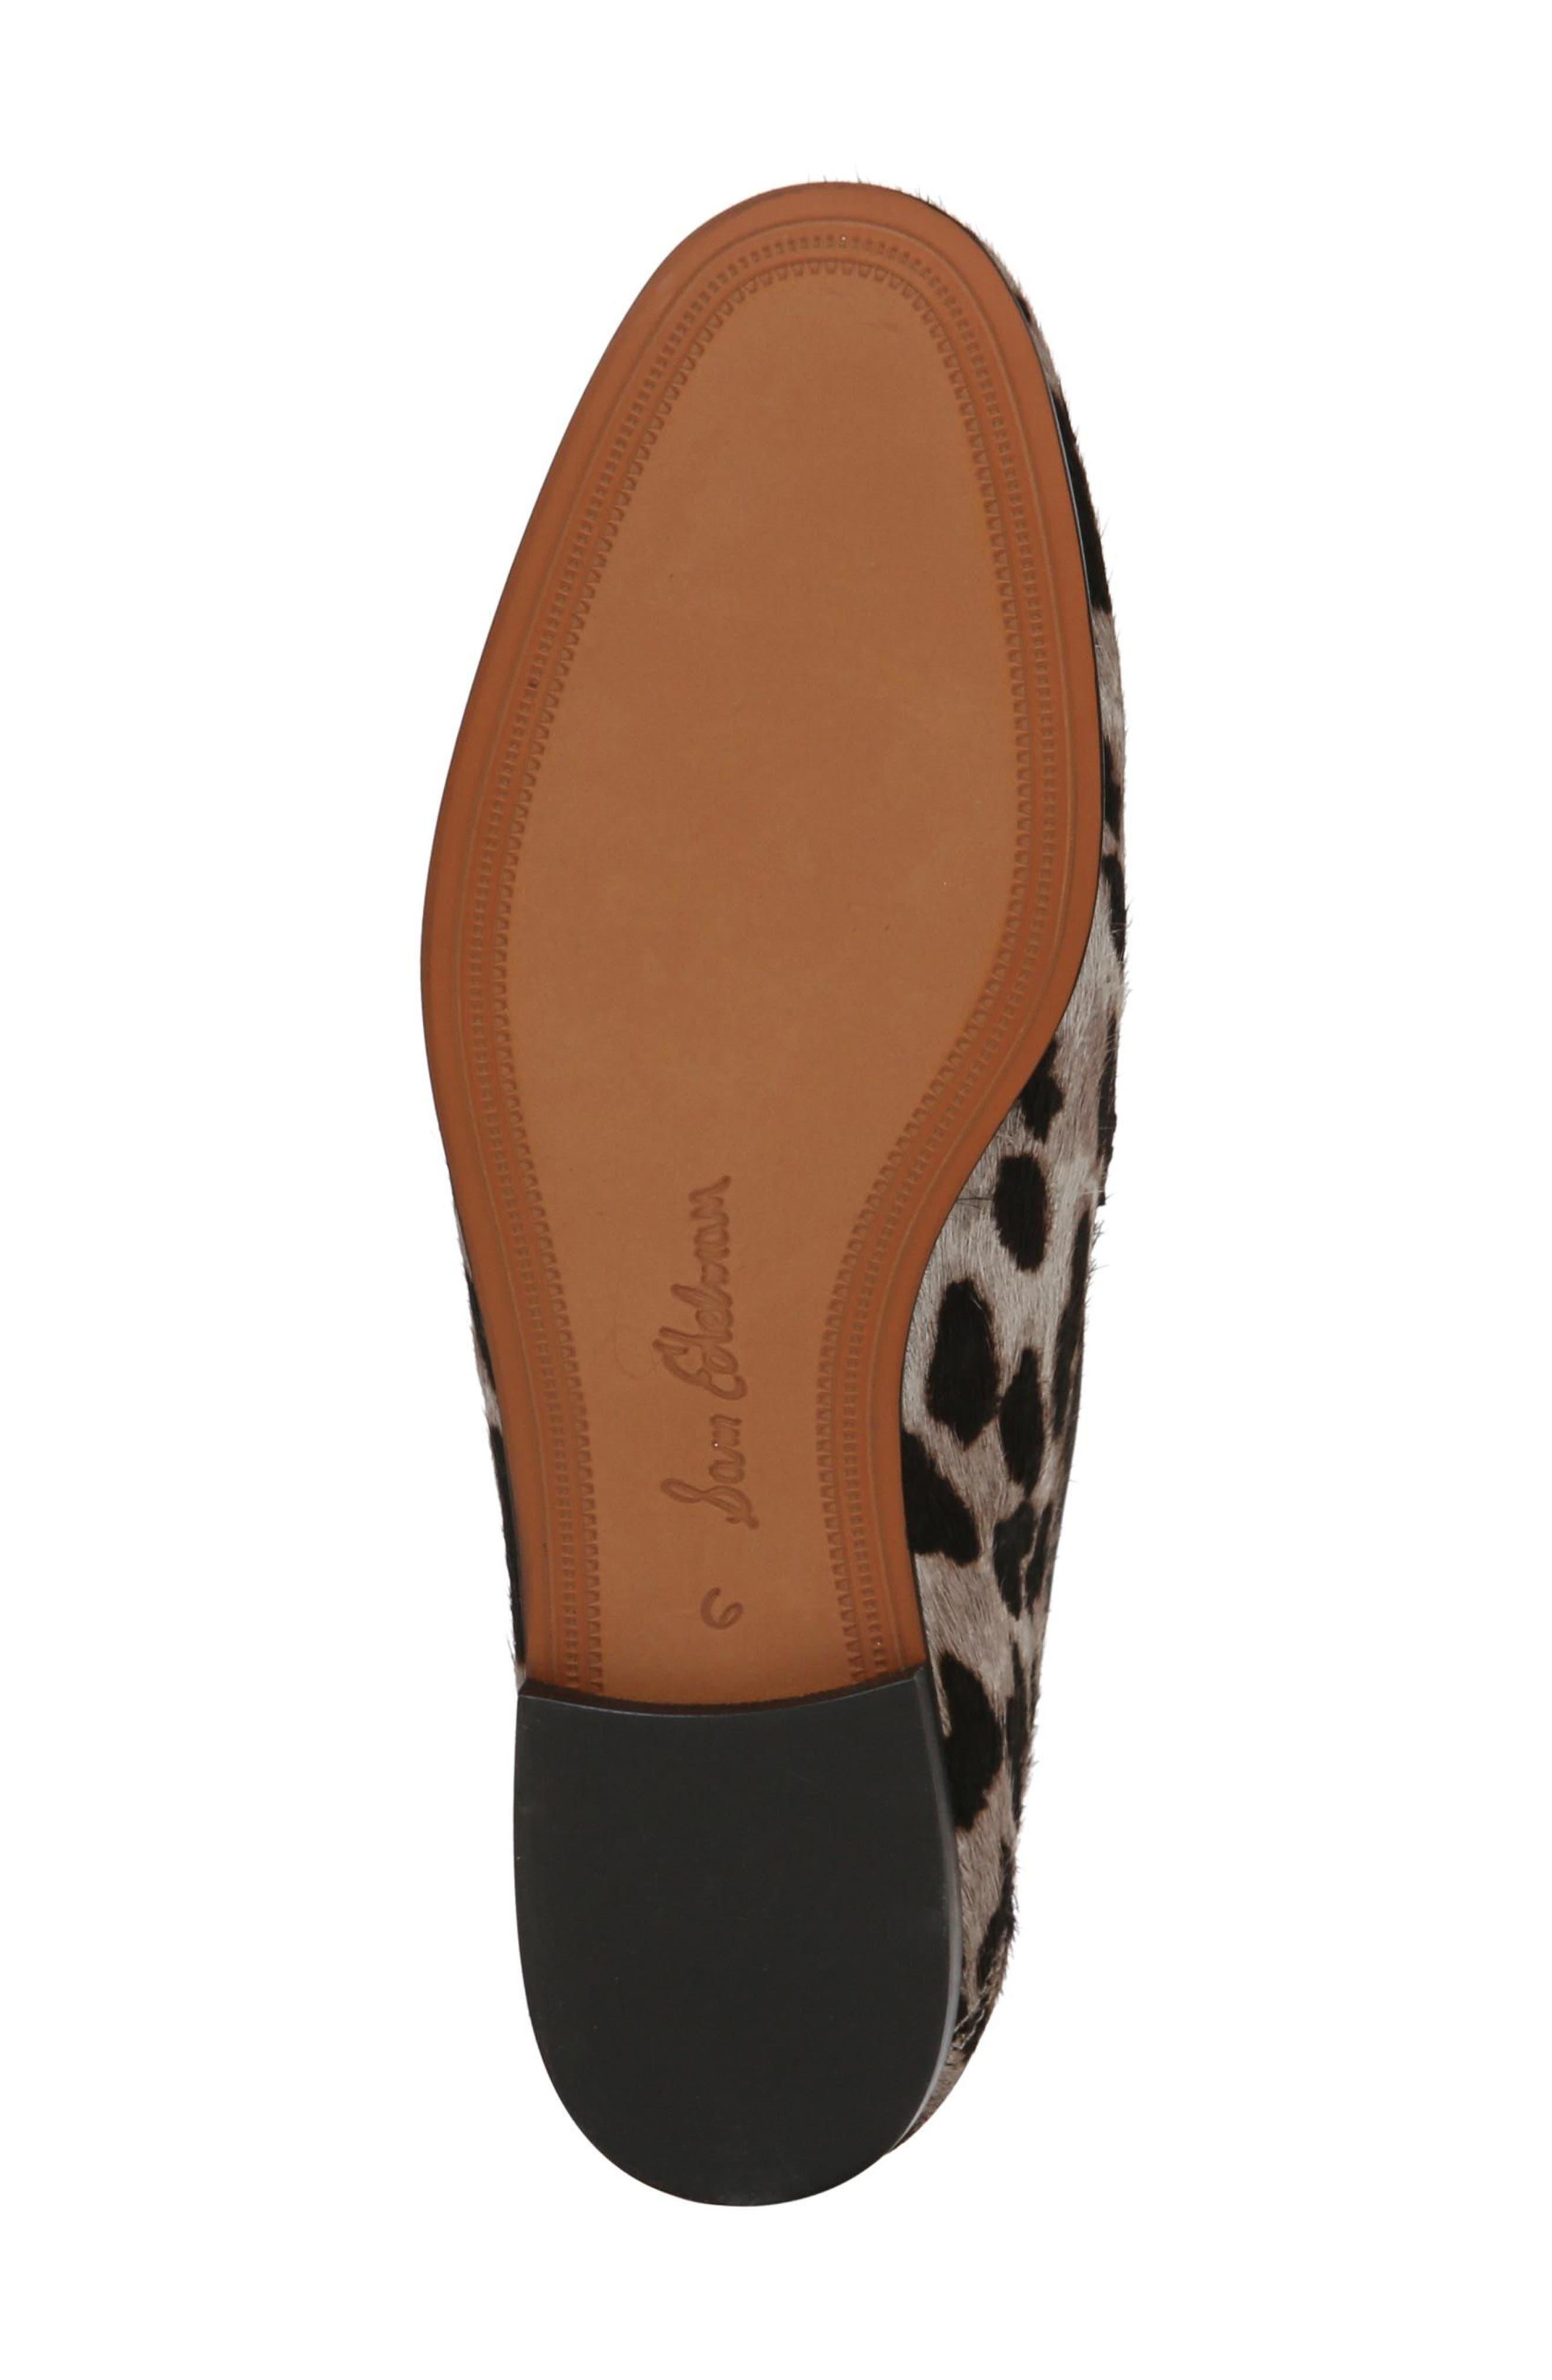 Lior Genuine Calf Hair Loafer,                             Alternate thumbnail 6, color,                             GREY MULTI LEOPARD CALF HAIR